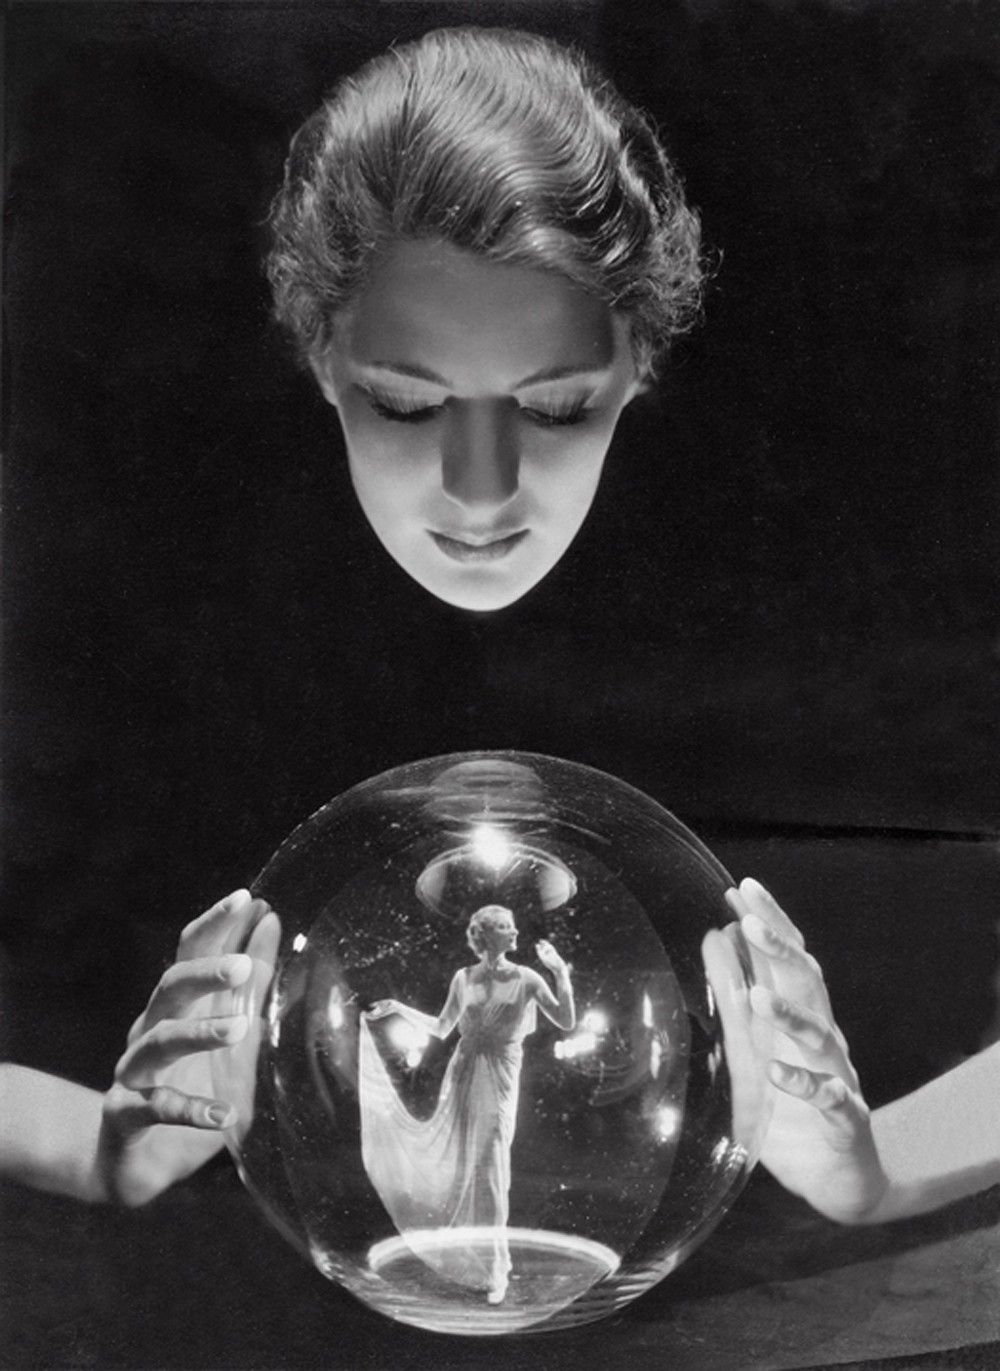 Lee-Miller-looking-down-at-Agneta-Fisher-Paris-1932.jpg 1,000×1,371 pixels